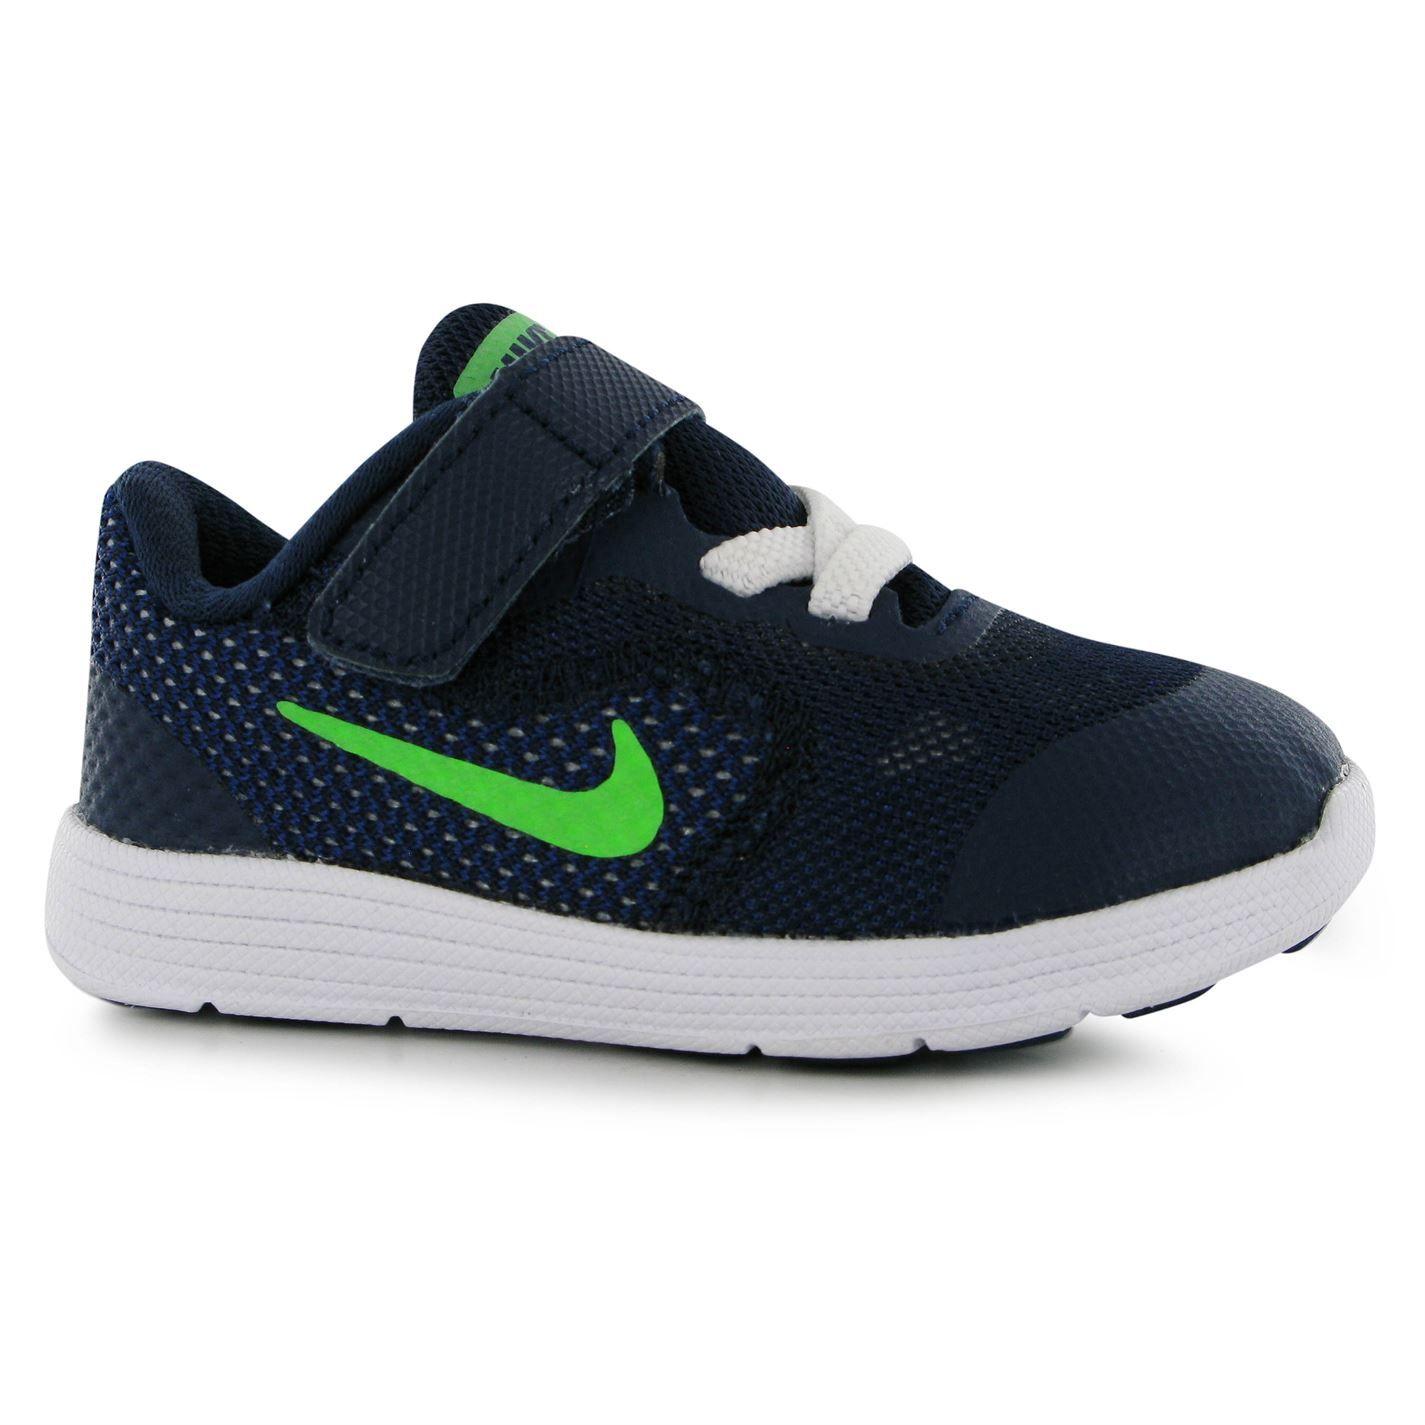 Nike Revolution 3 Inf63 - SportsDirect.com  c3da720c2